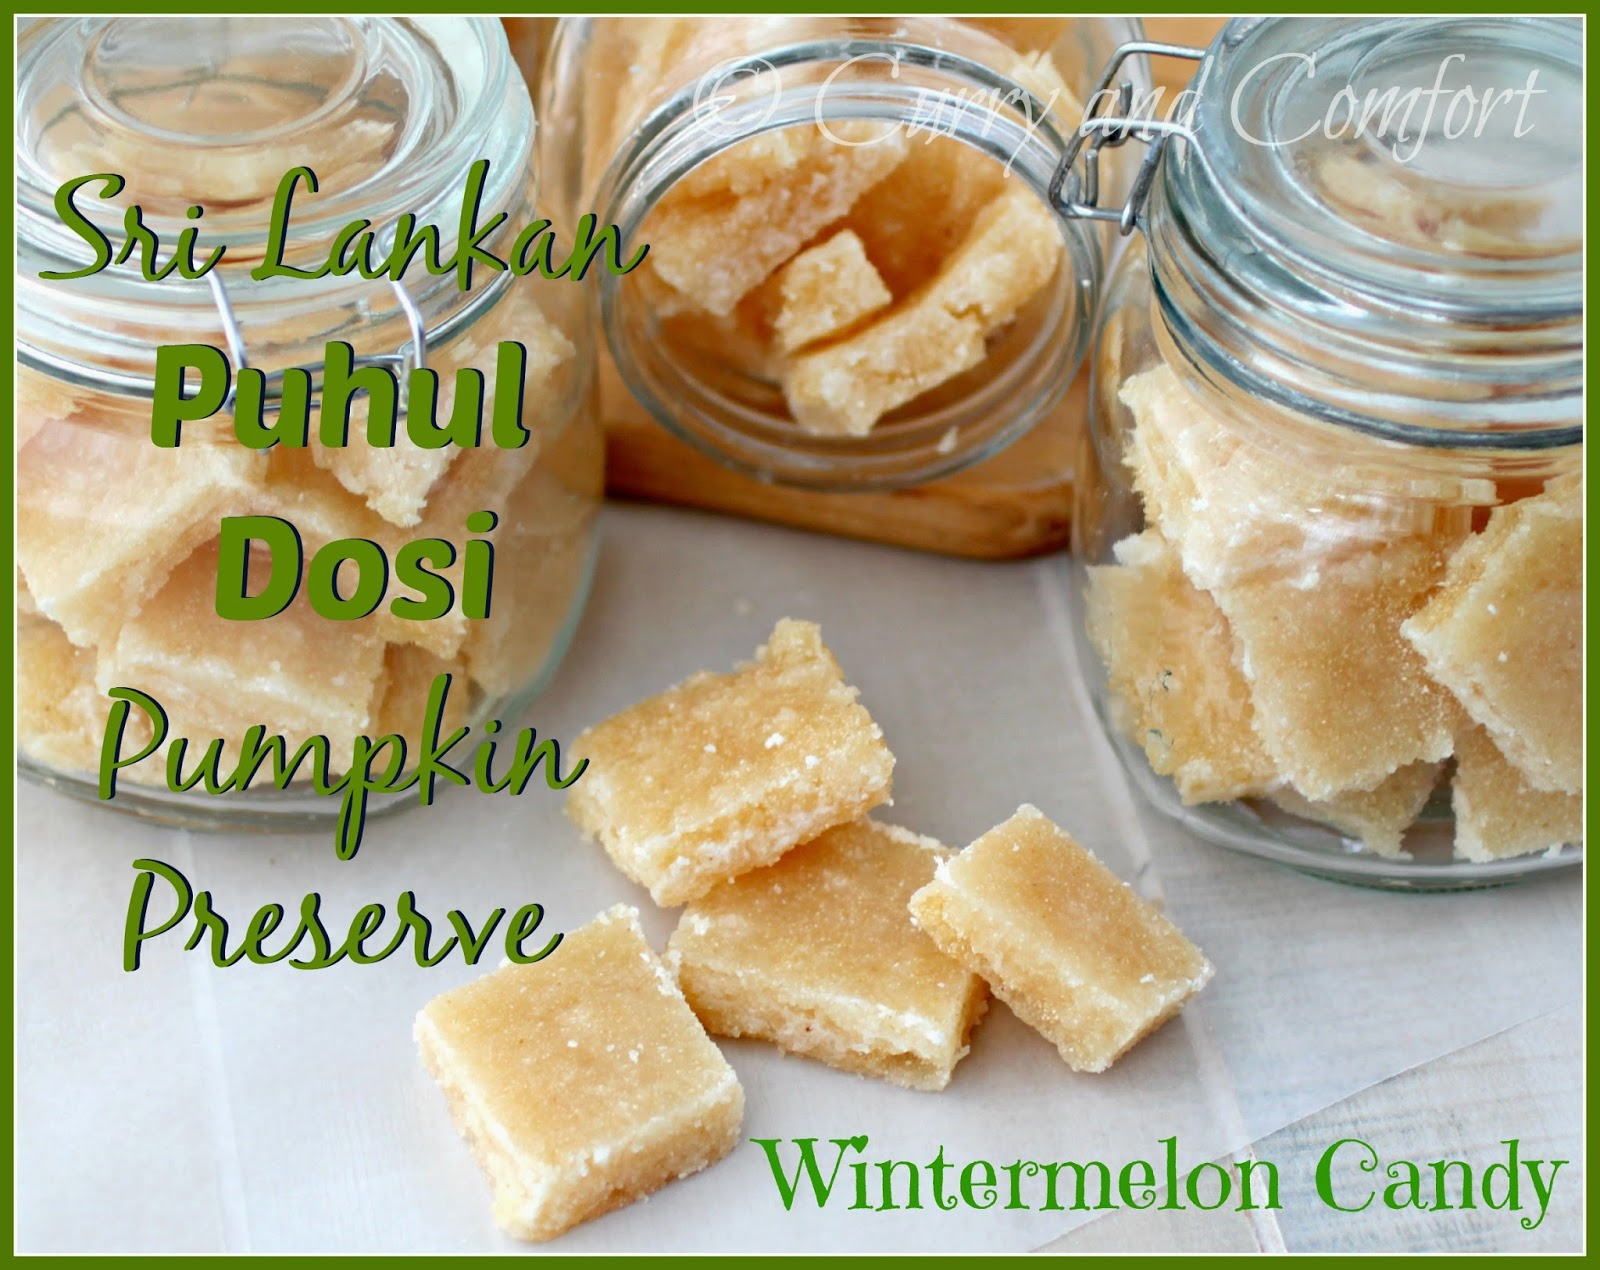 Kitchen Simmer Wintermelon Candy Sri Lankan Puhul Dosi Pumpkin Preserve